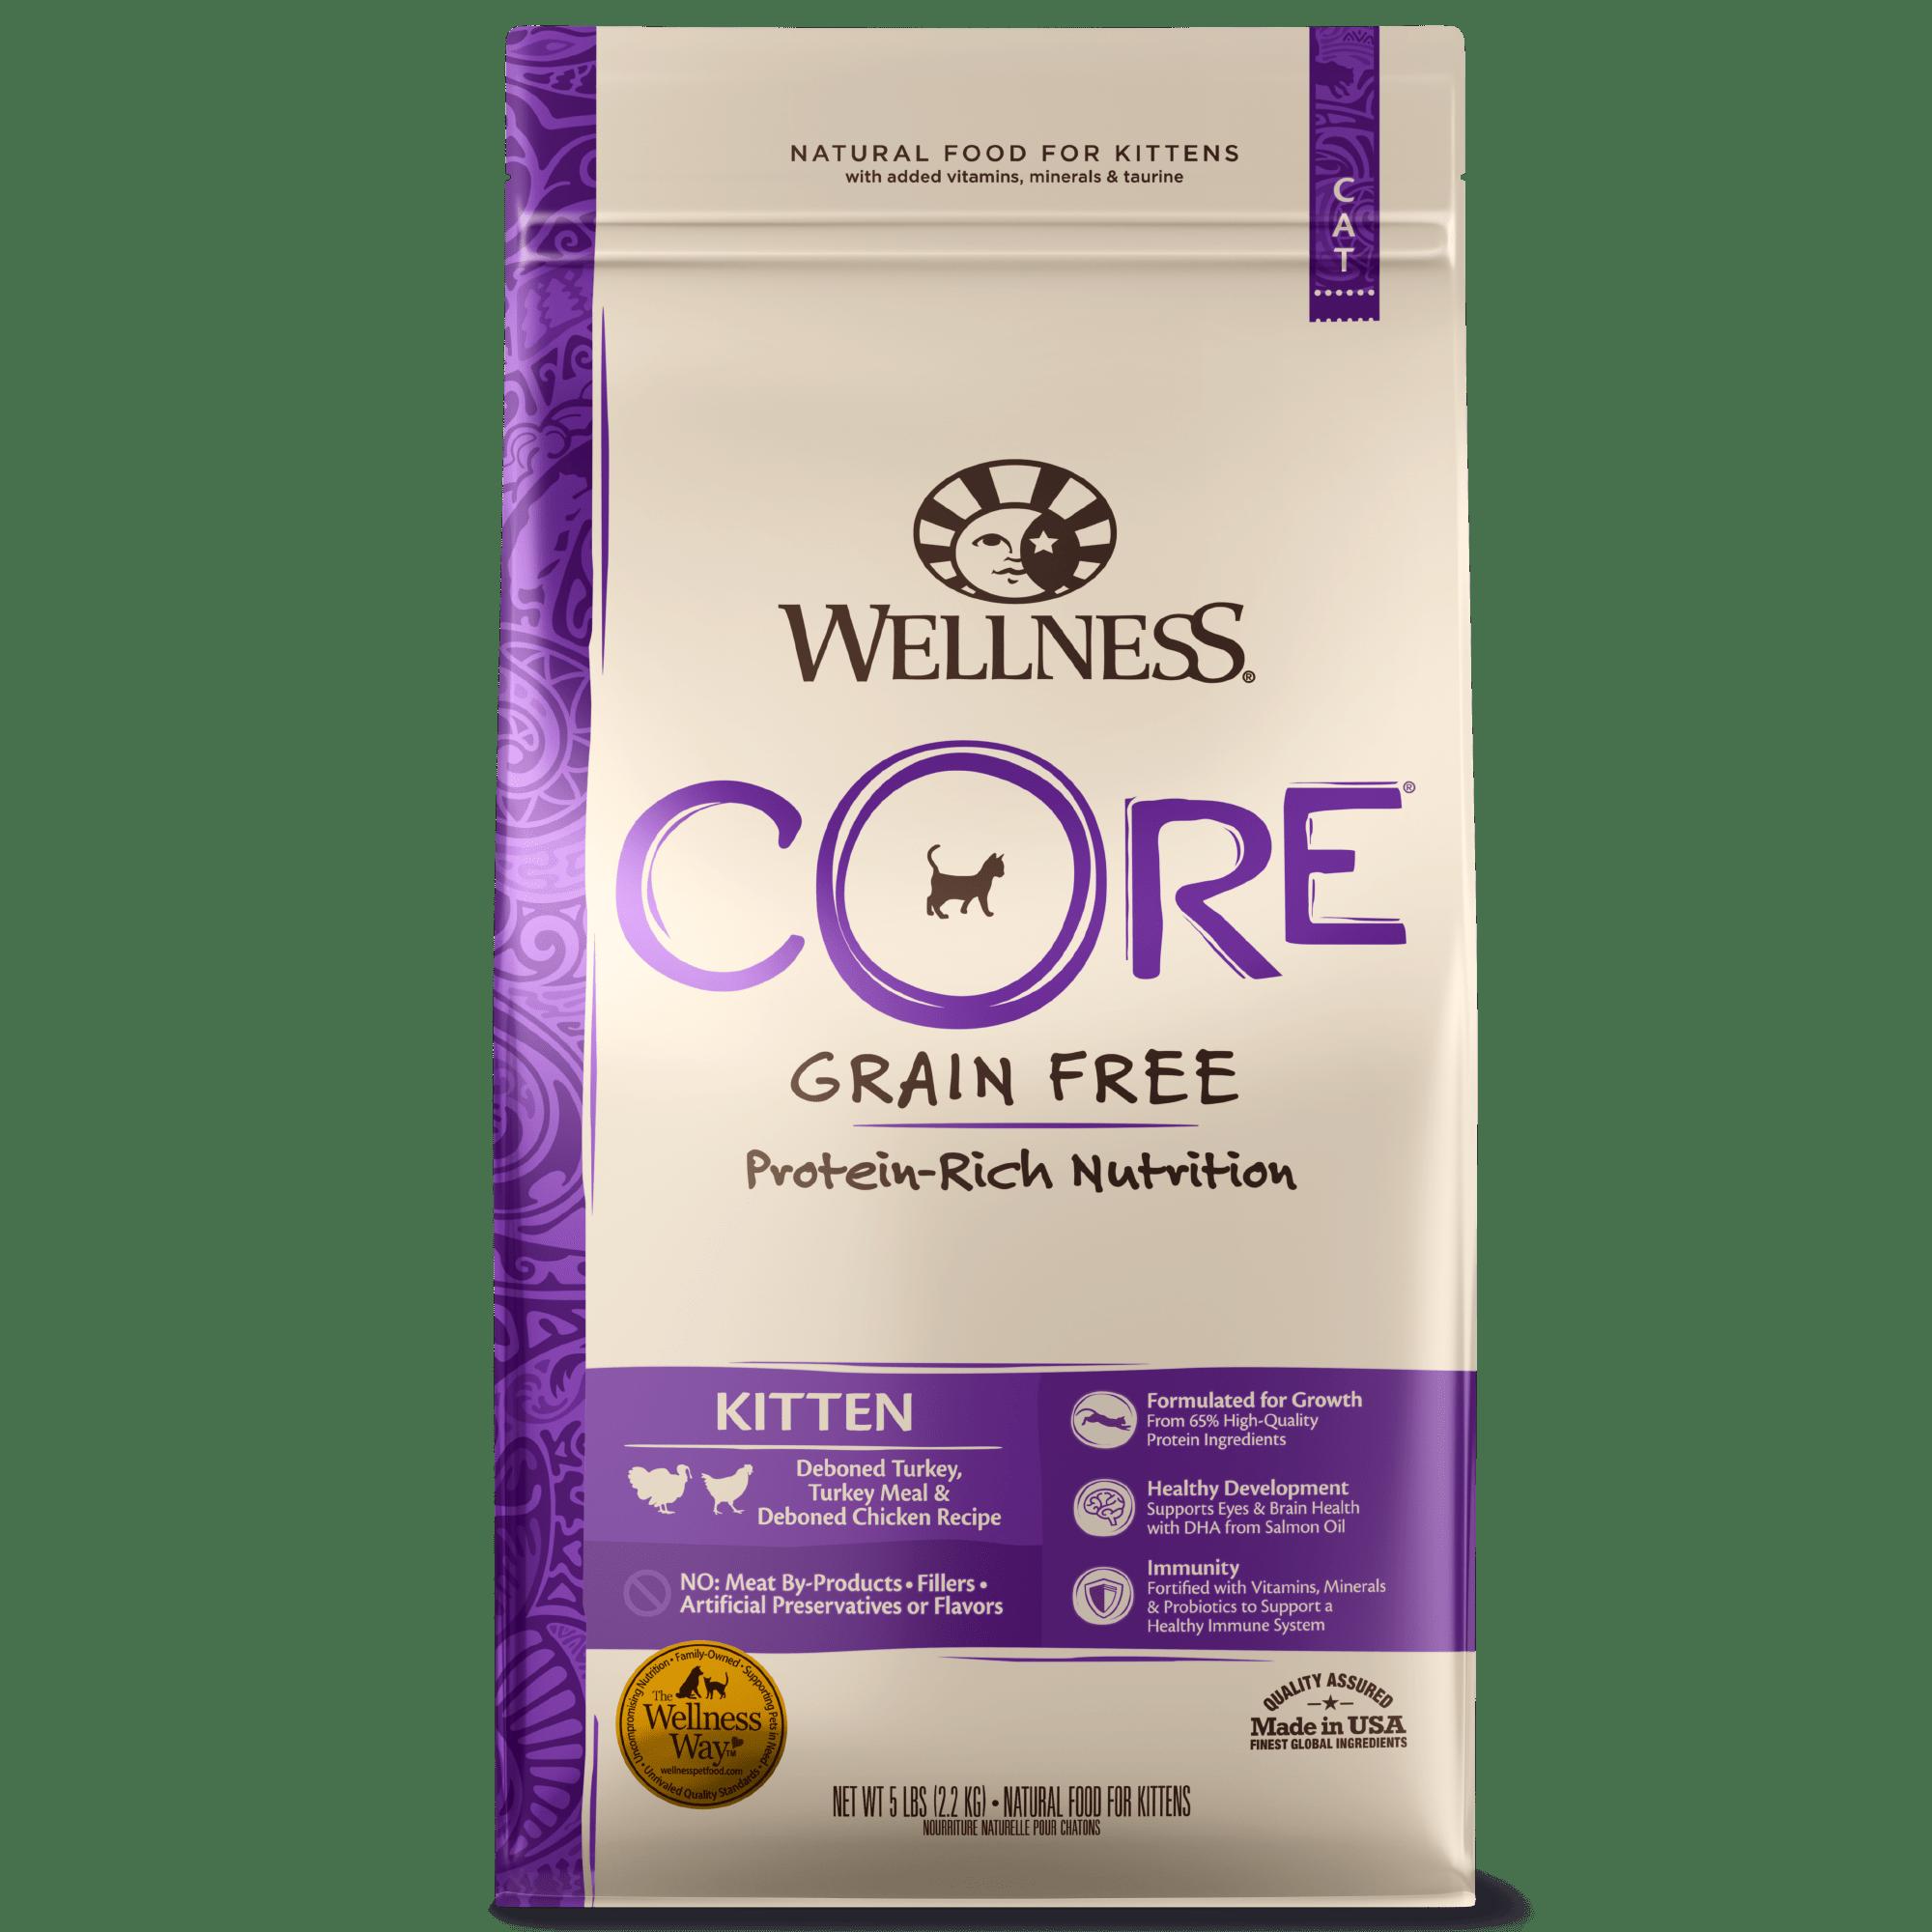 Core Grain Free Kitten Formula